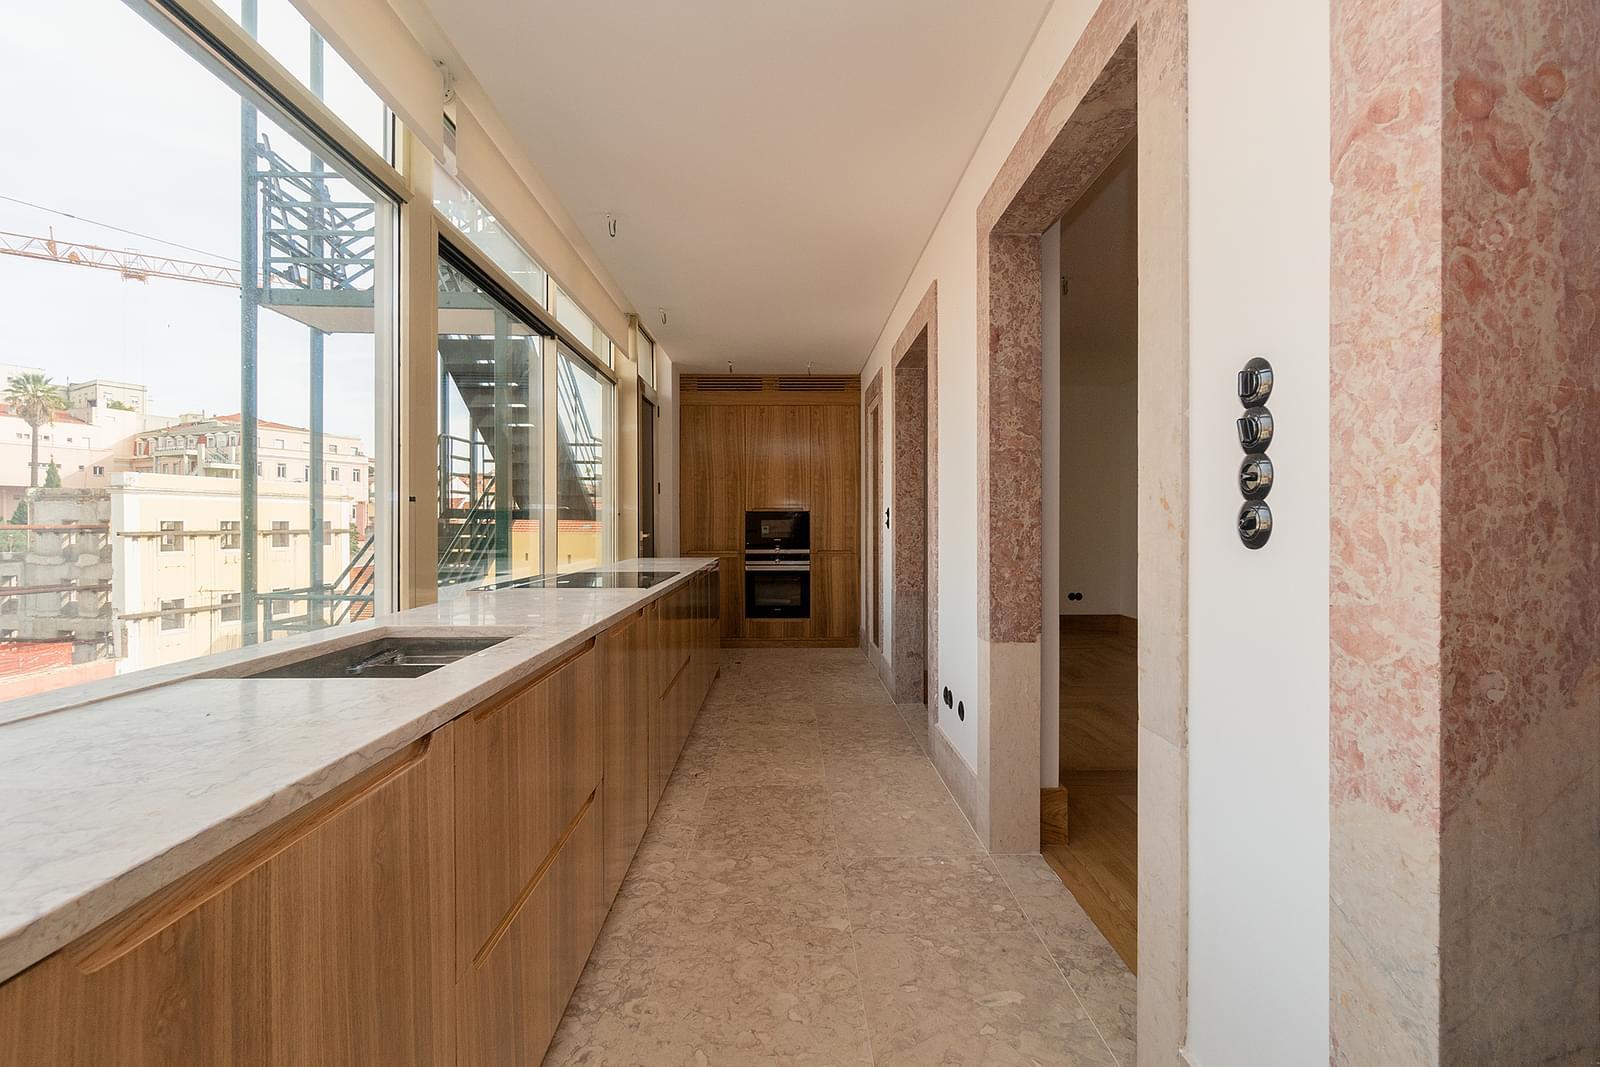 pf18665-apartamento-t3-2-lisboa-83535f86-f912-4729-b905-ac4c10912194